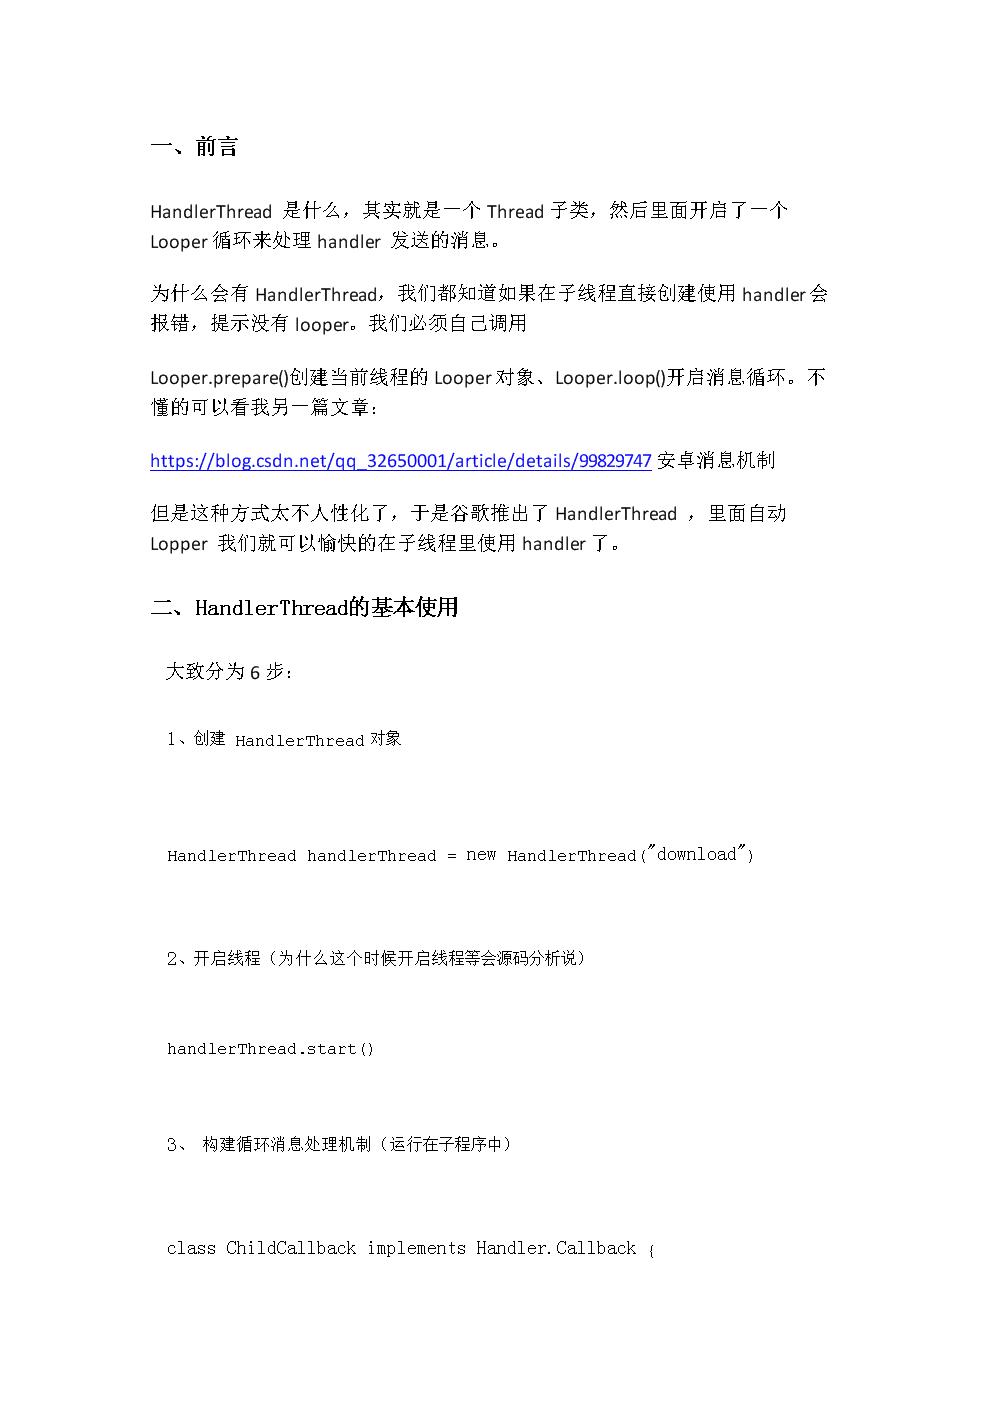 HandlerThread源码分析原创.docx